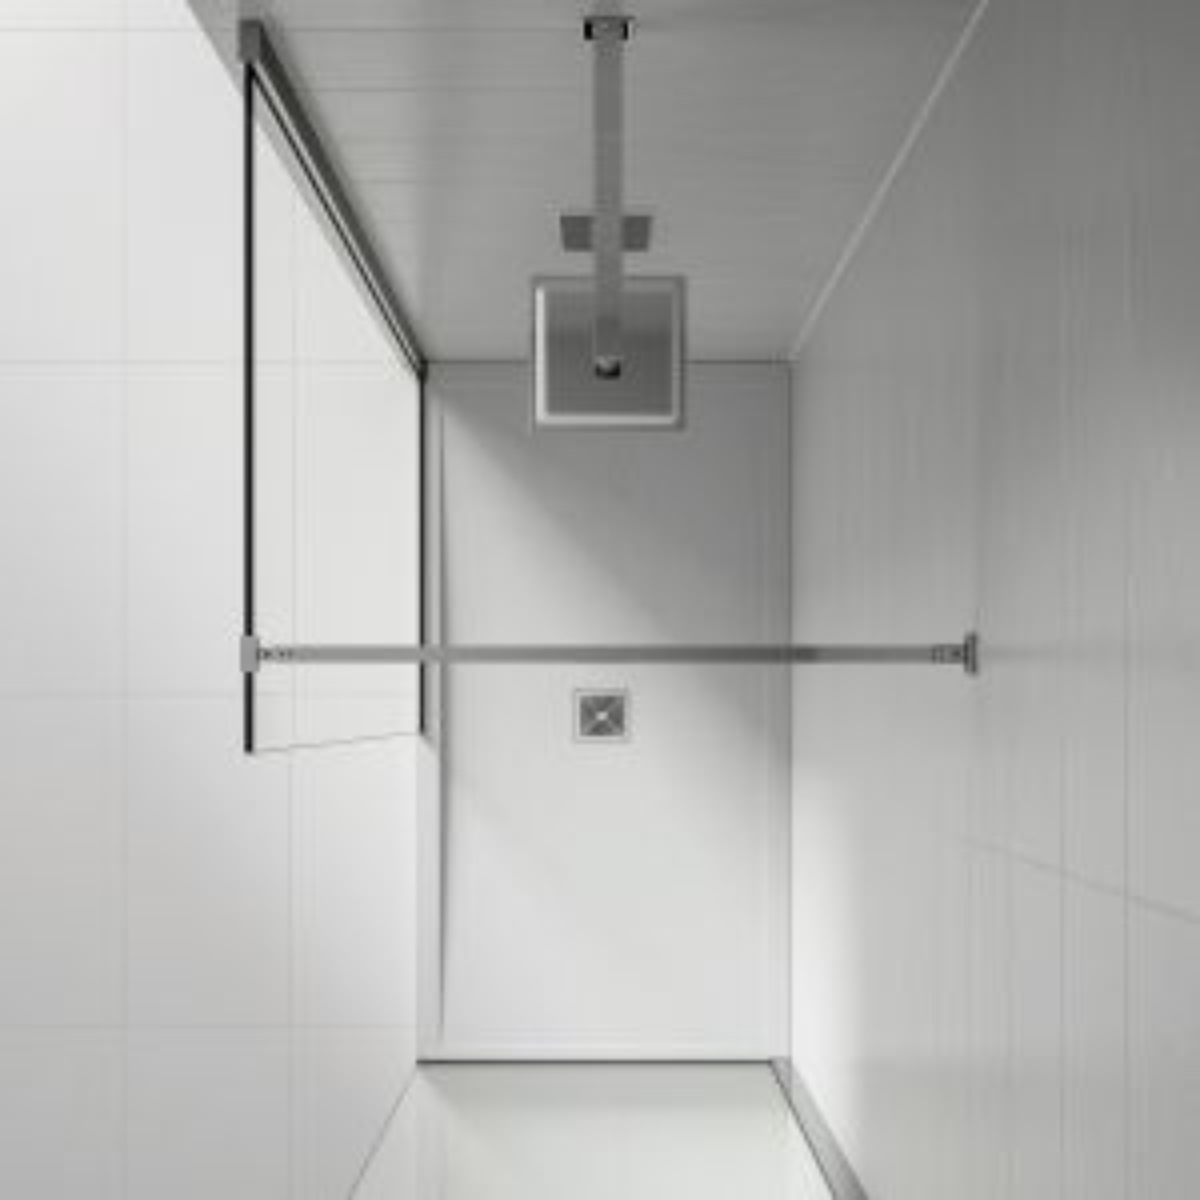 Aquadart White Slate Shower Tray 1200 x 700 Overhead